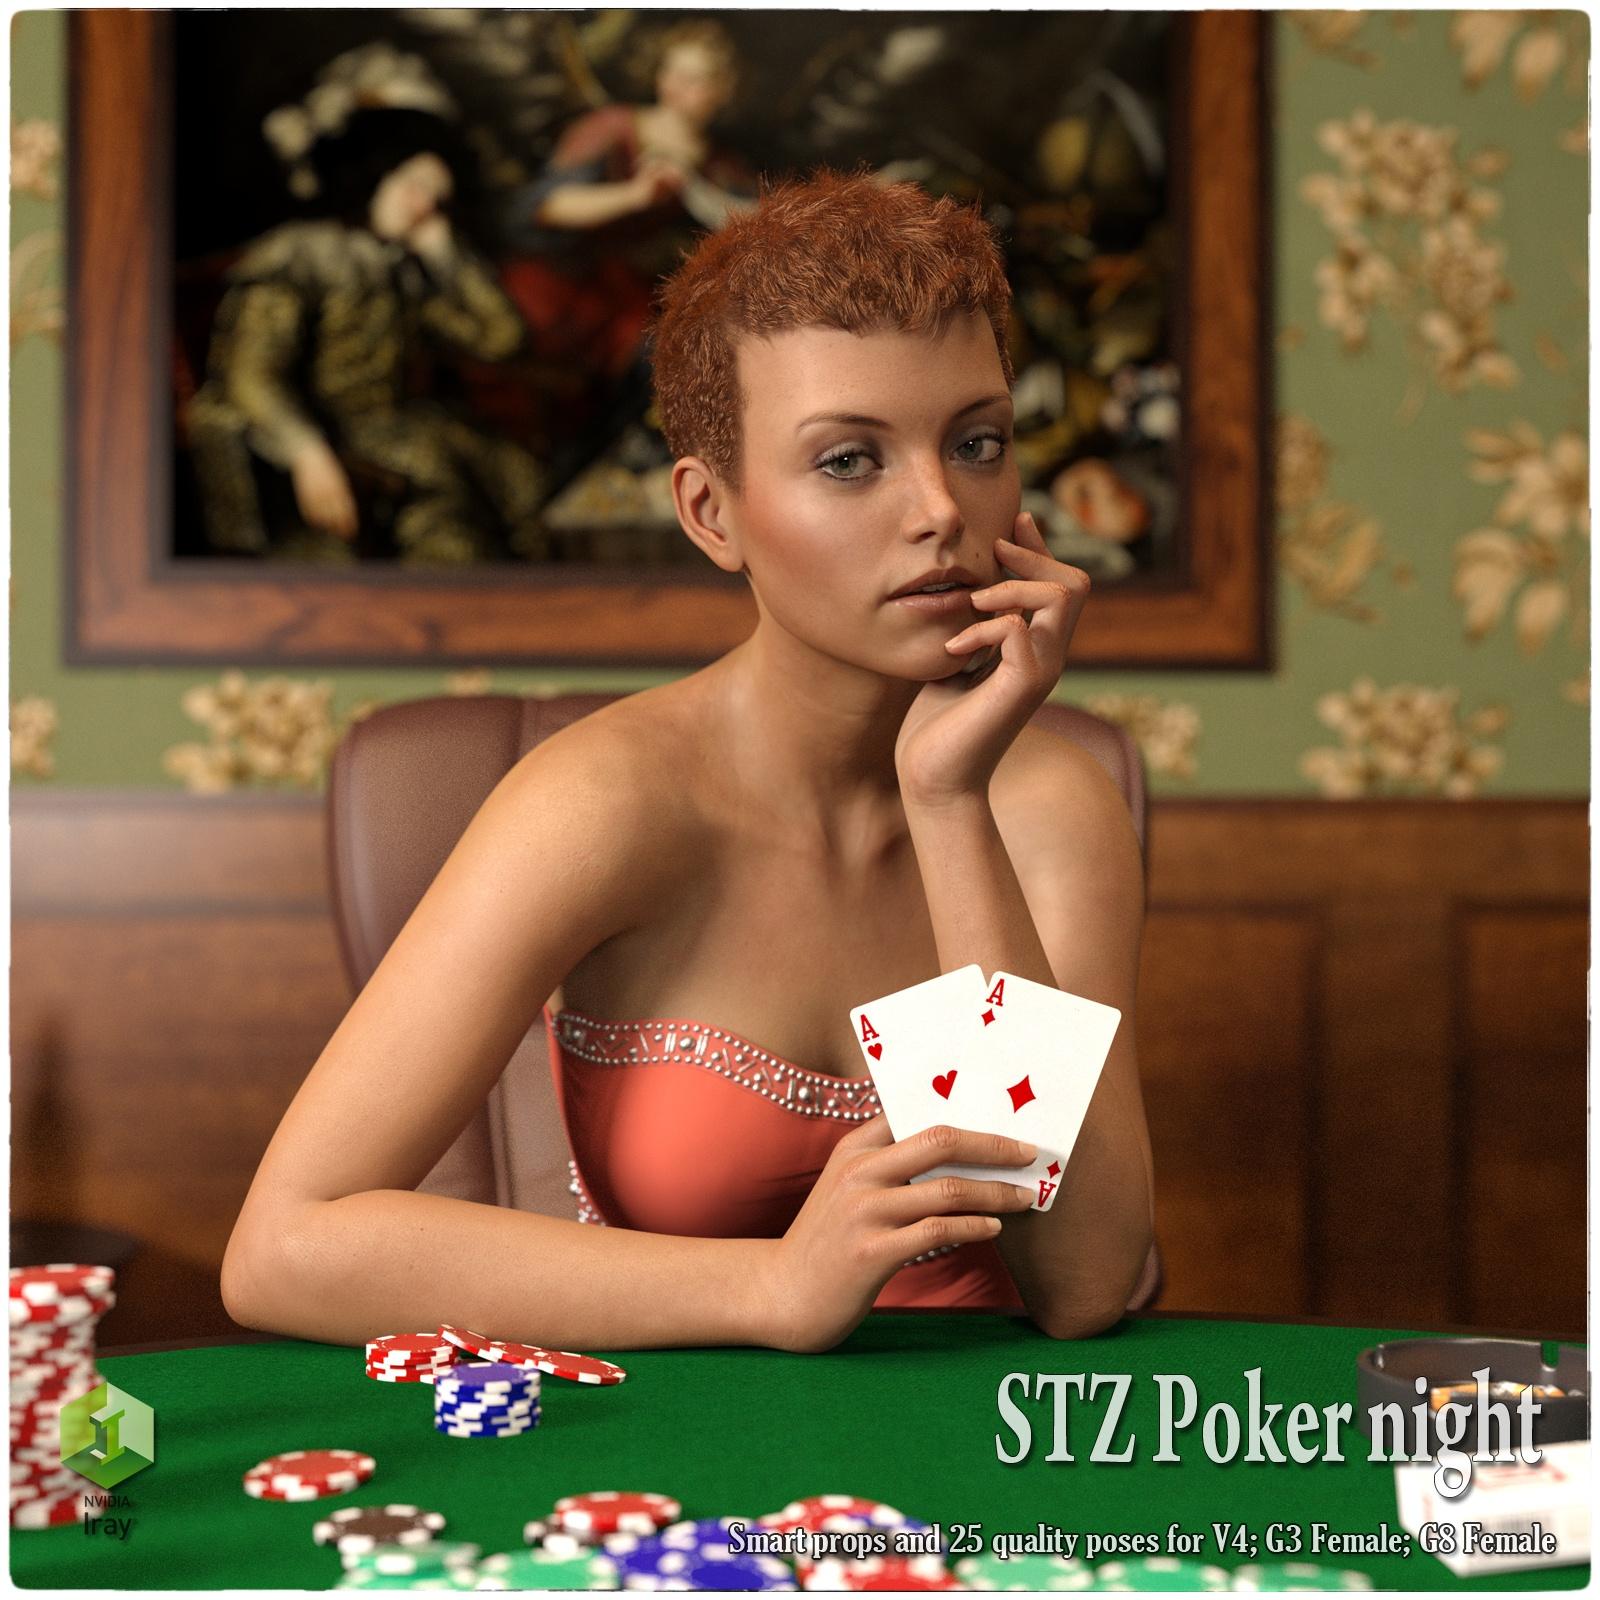 stz-poker-night